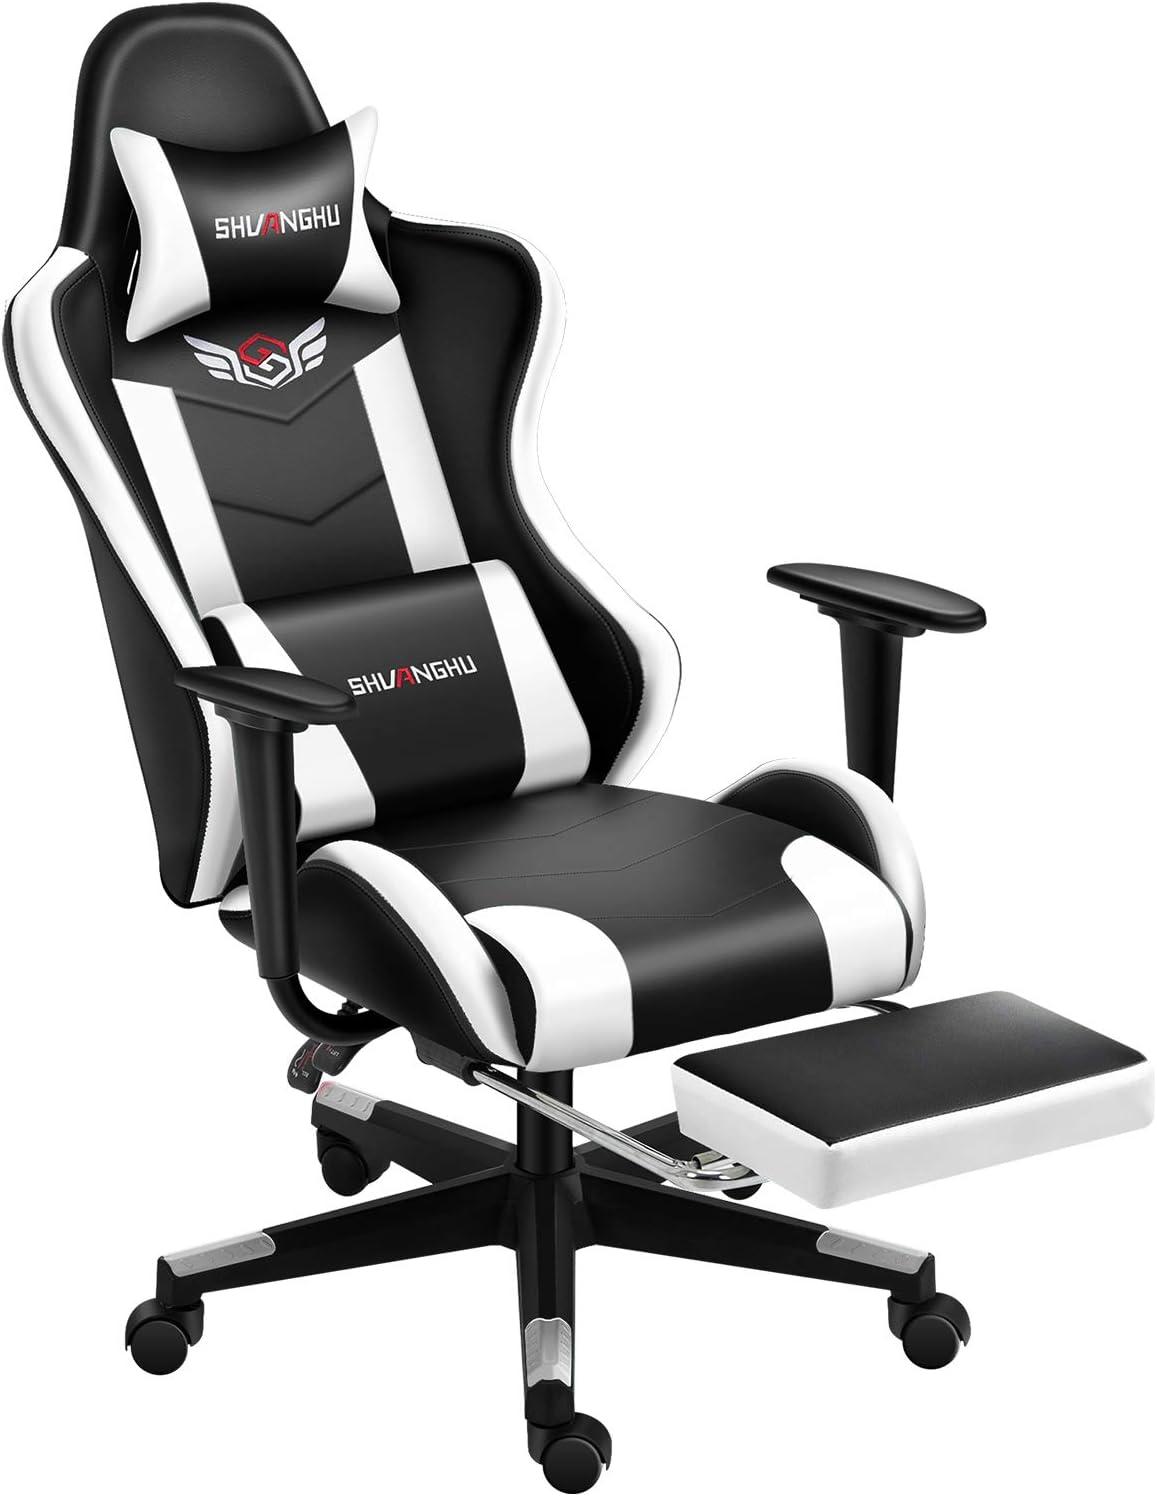 Shuanghu Gaming Chair Review